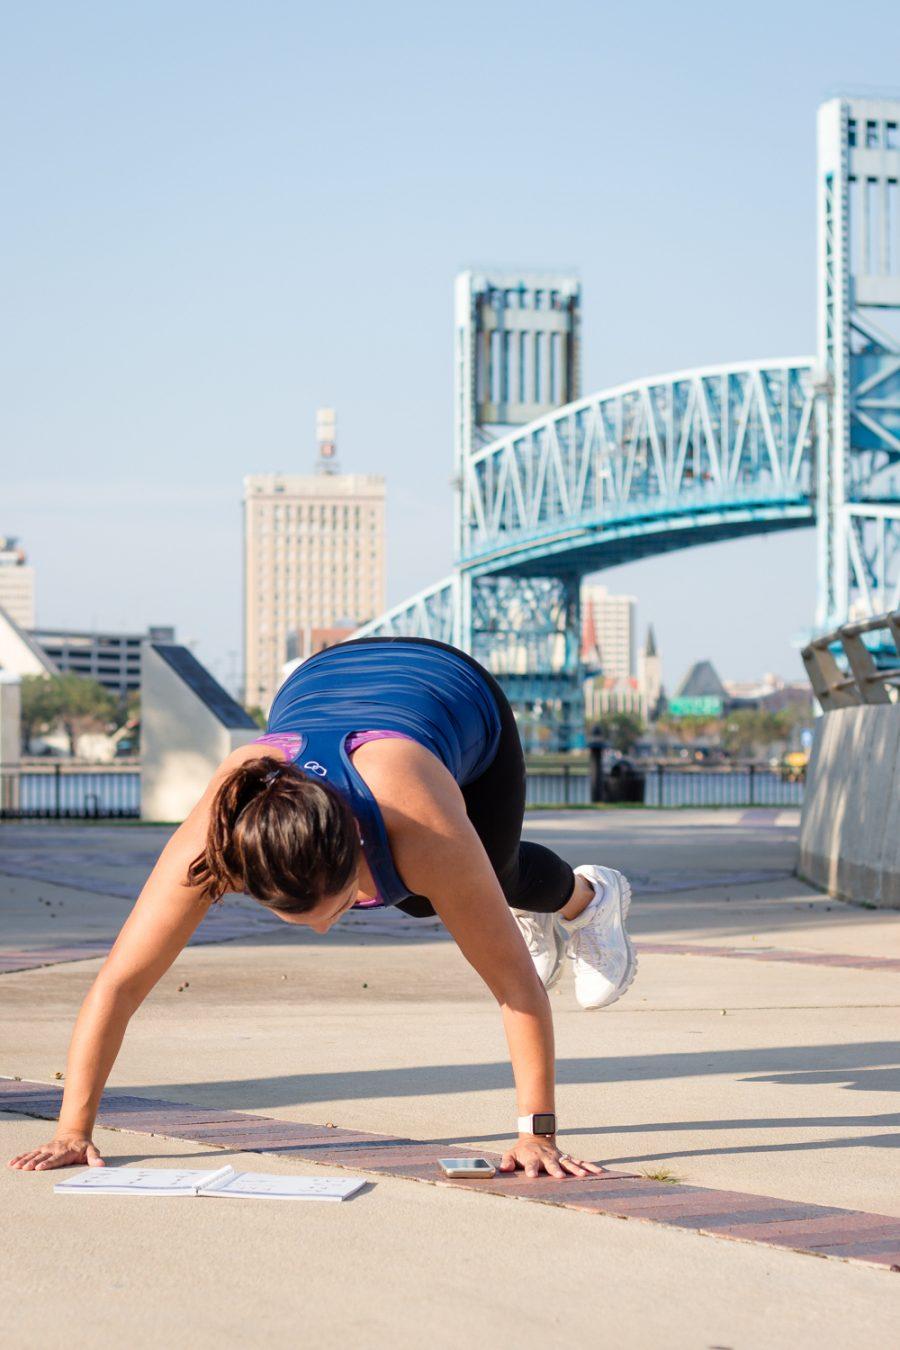 BodyBoss Fitness Guide Review | Side Jacks 2